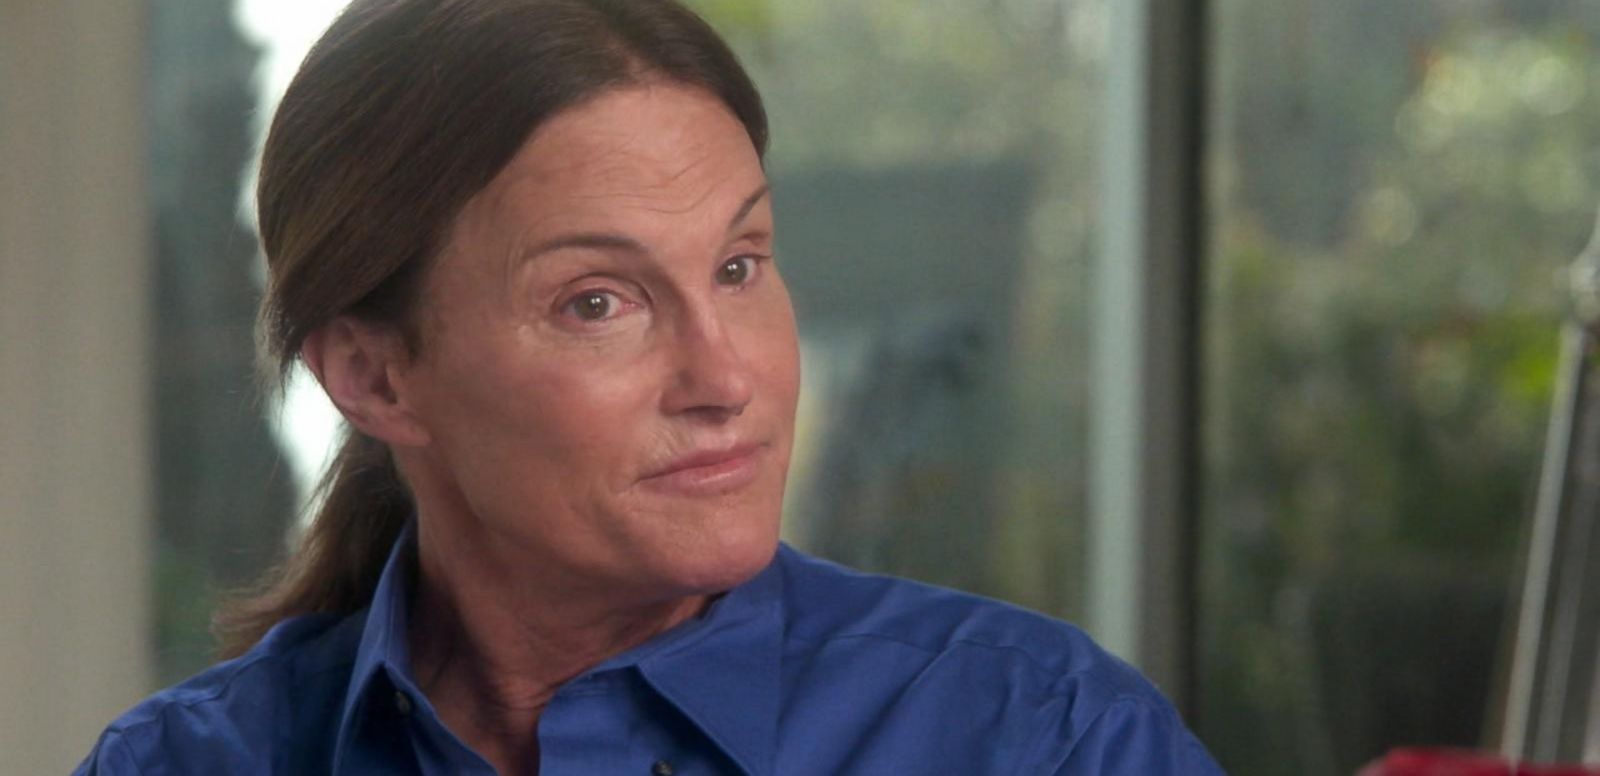 VIDEO: Bruce Jenner, I Am a Woman